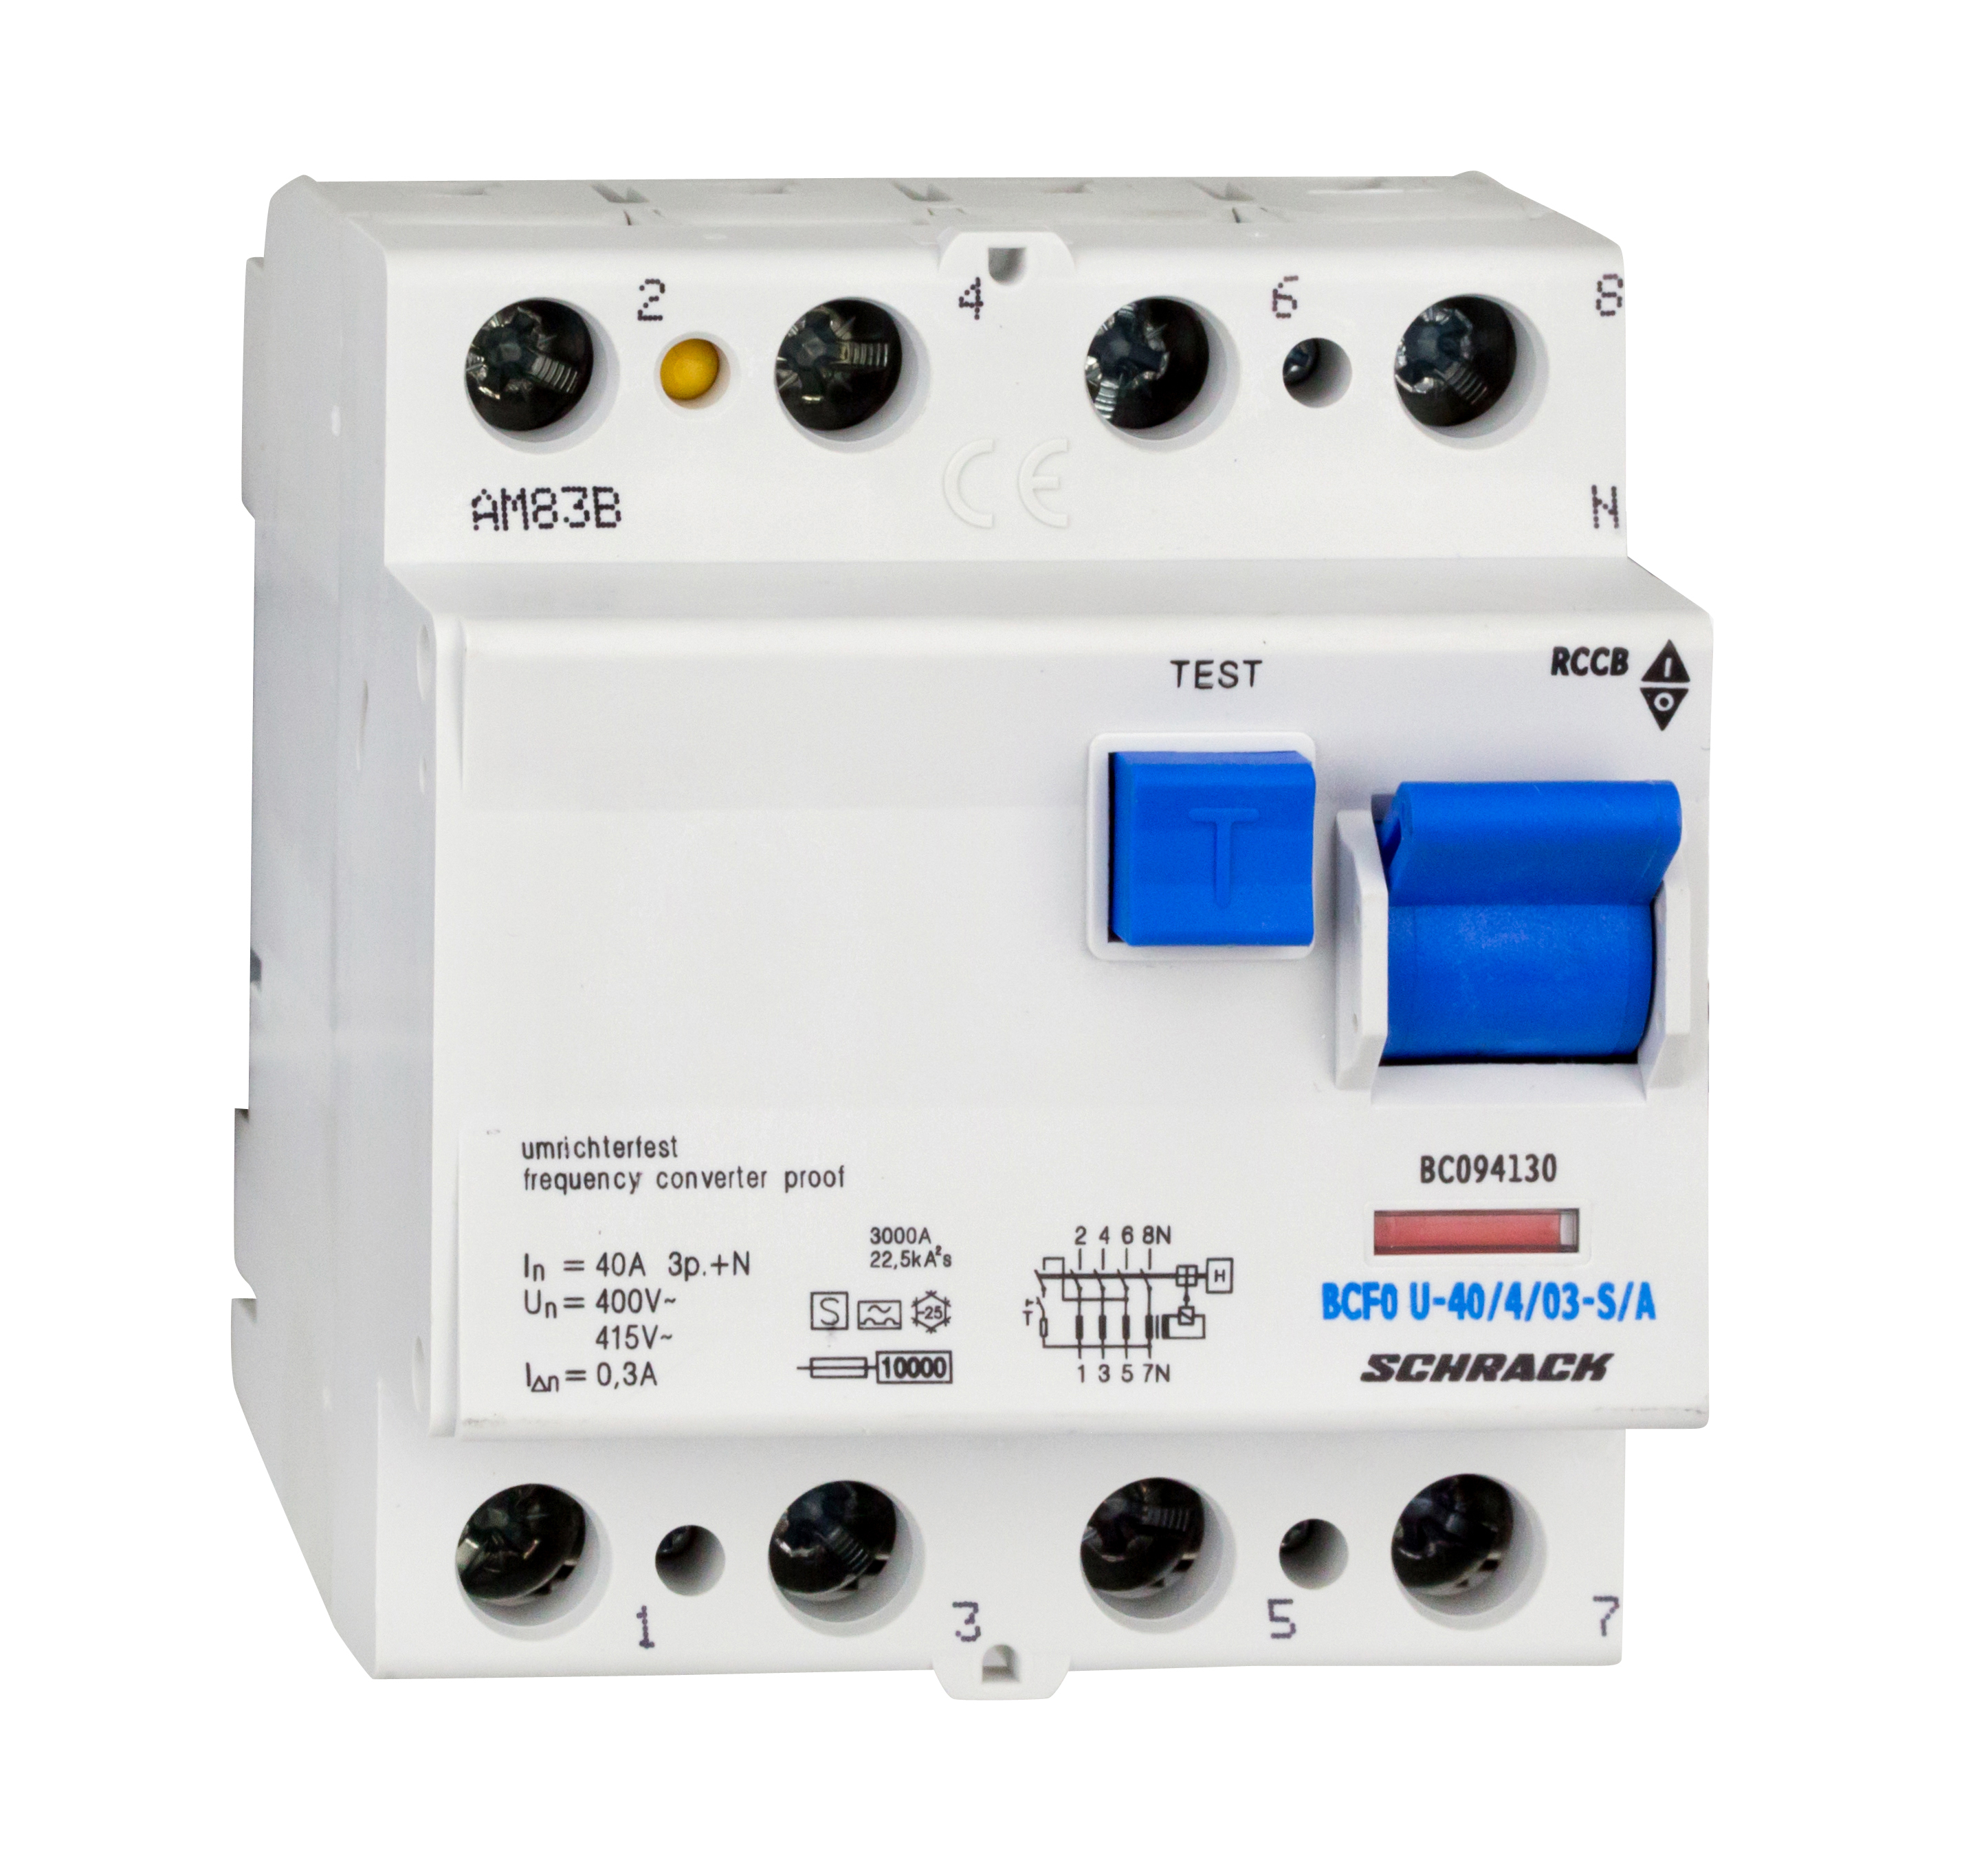 1 Stk FI-Schalter, FU fest, 40A, 4-polig, 300mA, Bauart S, Typ A BC094130--